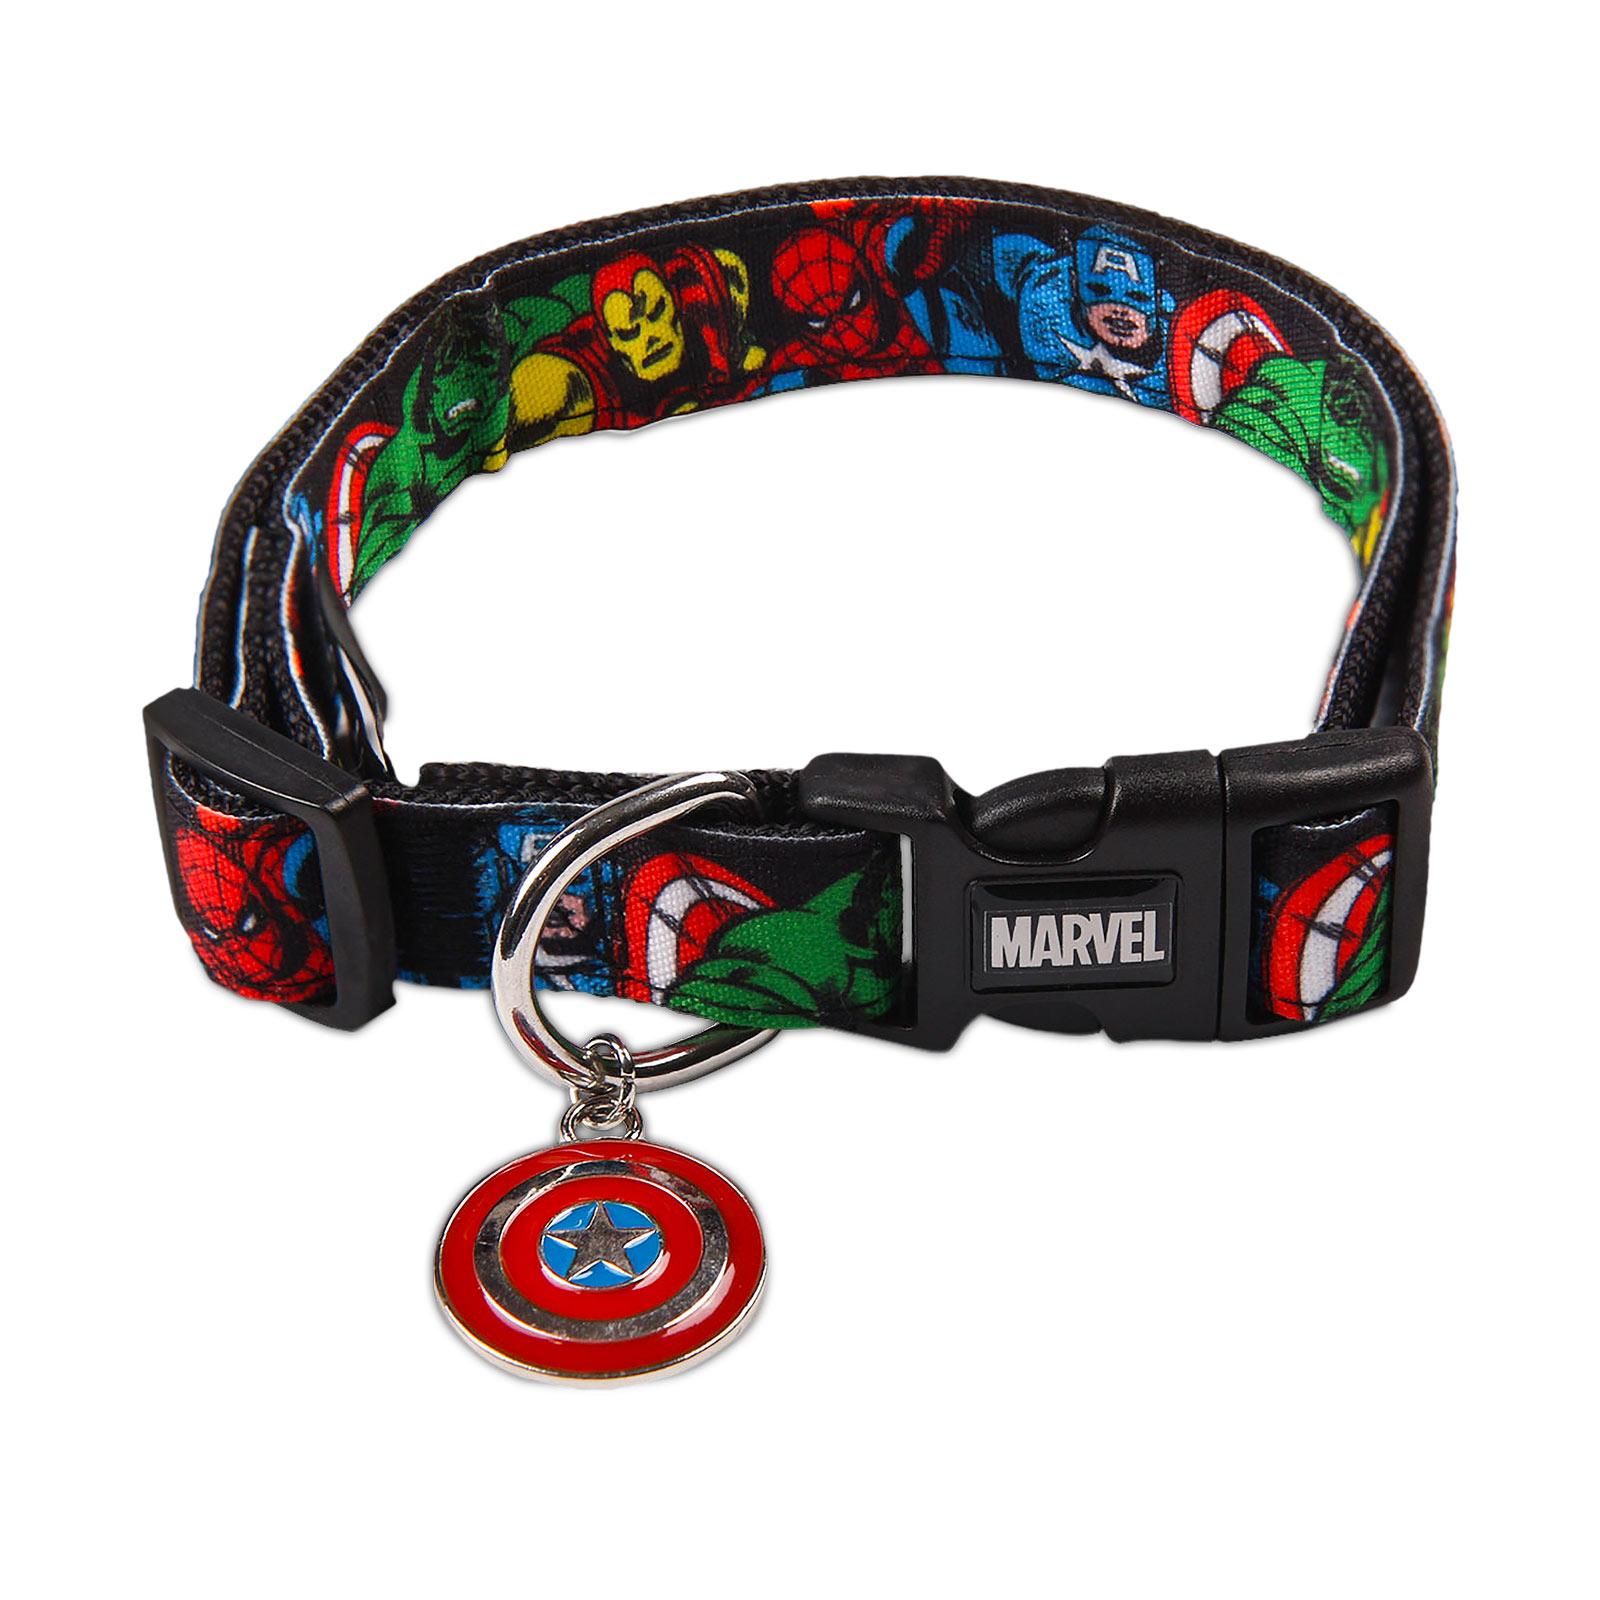 Avengers - Comic Heroes Klick-Halsband für Hunde